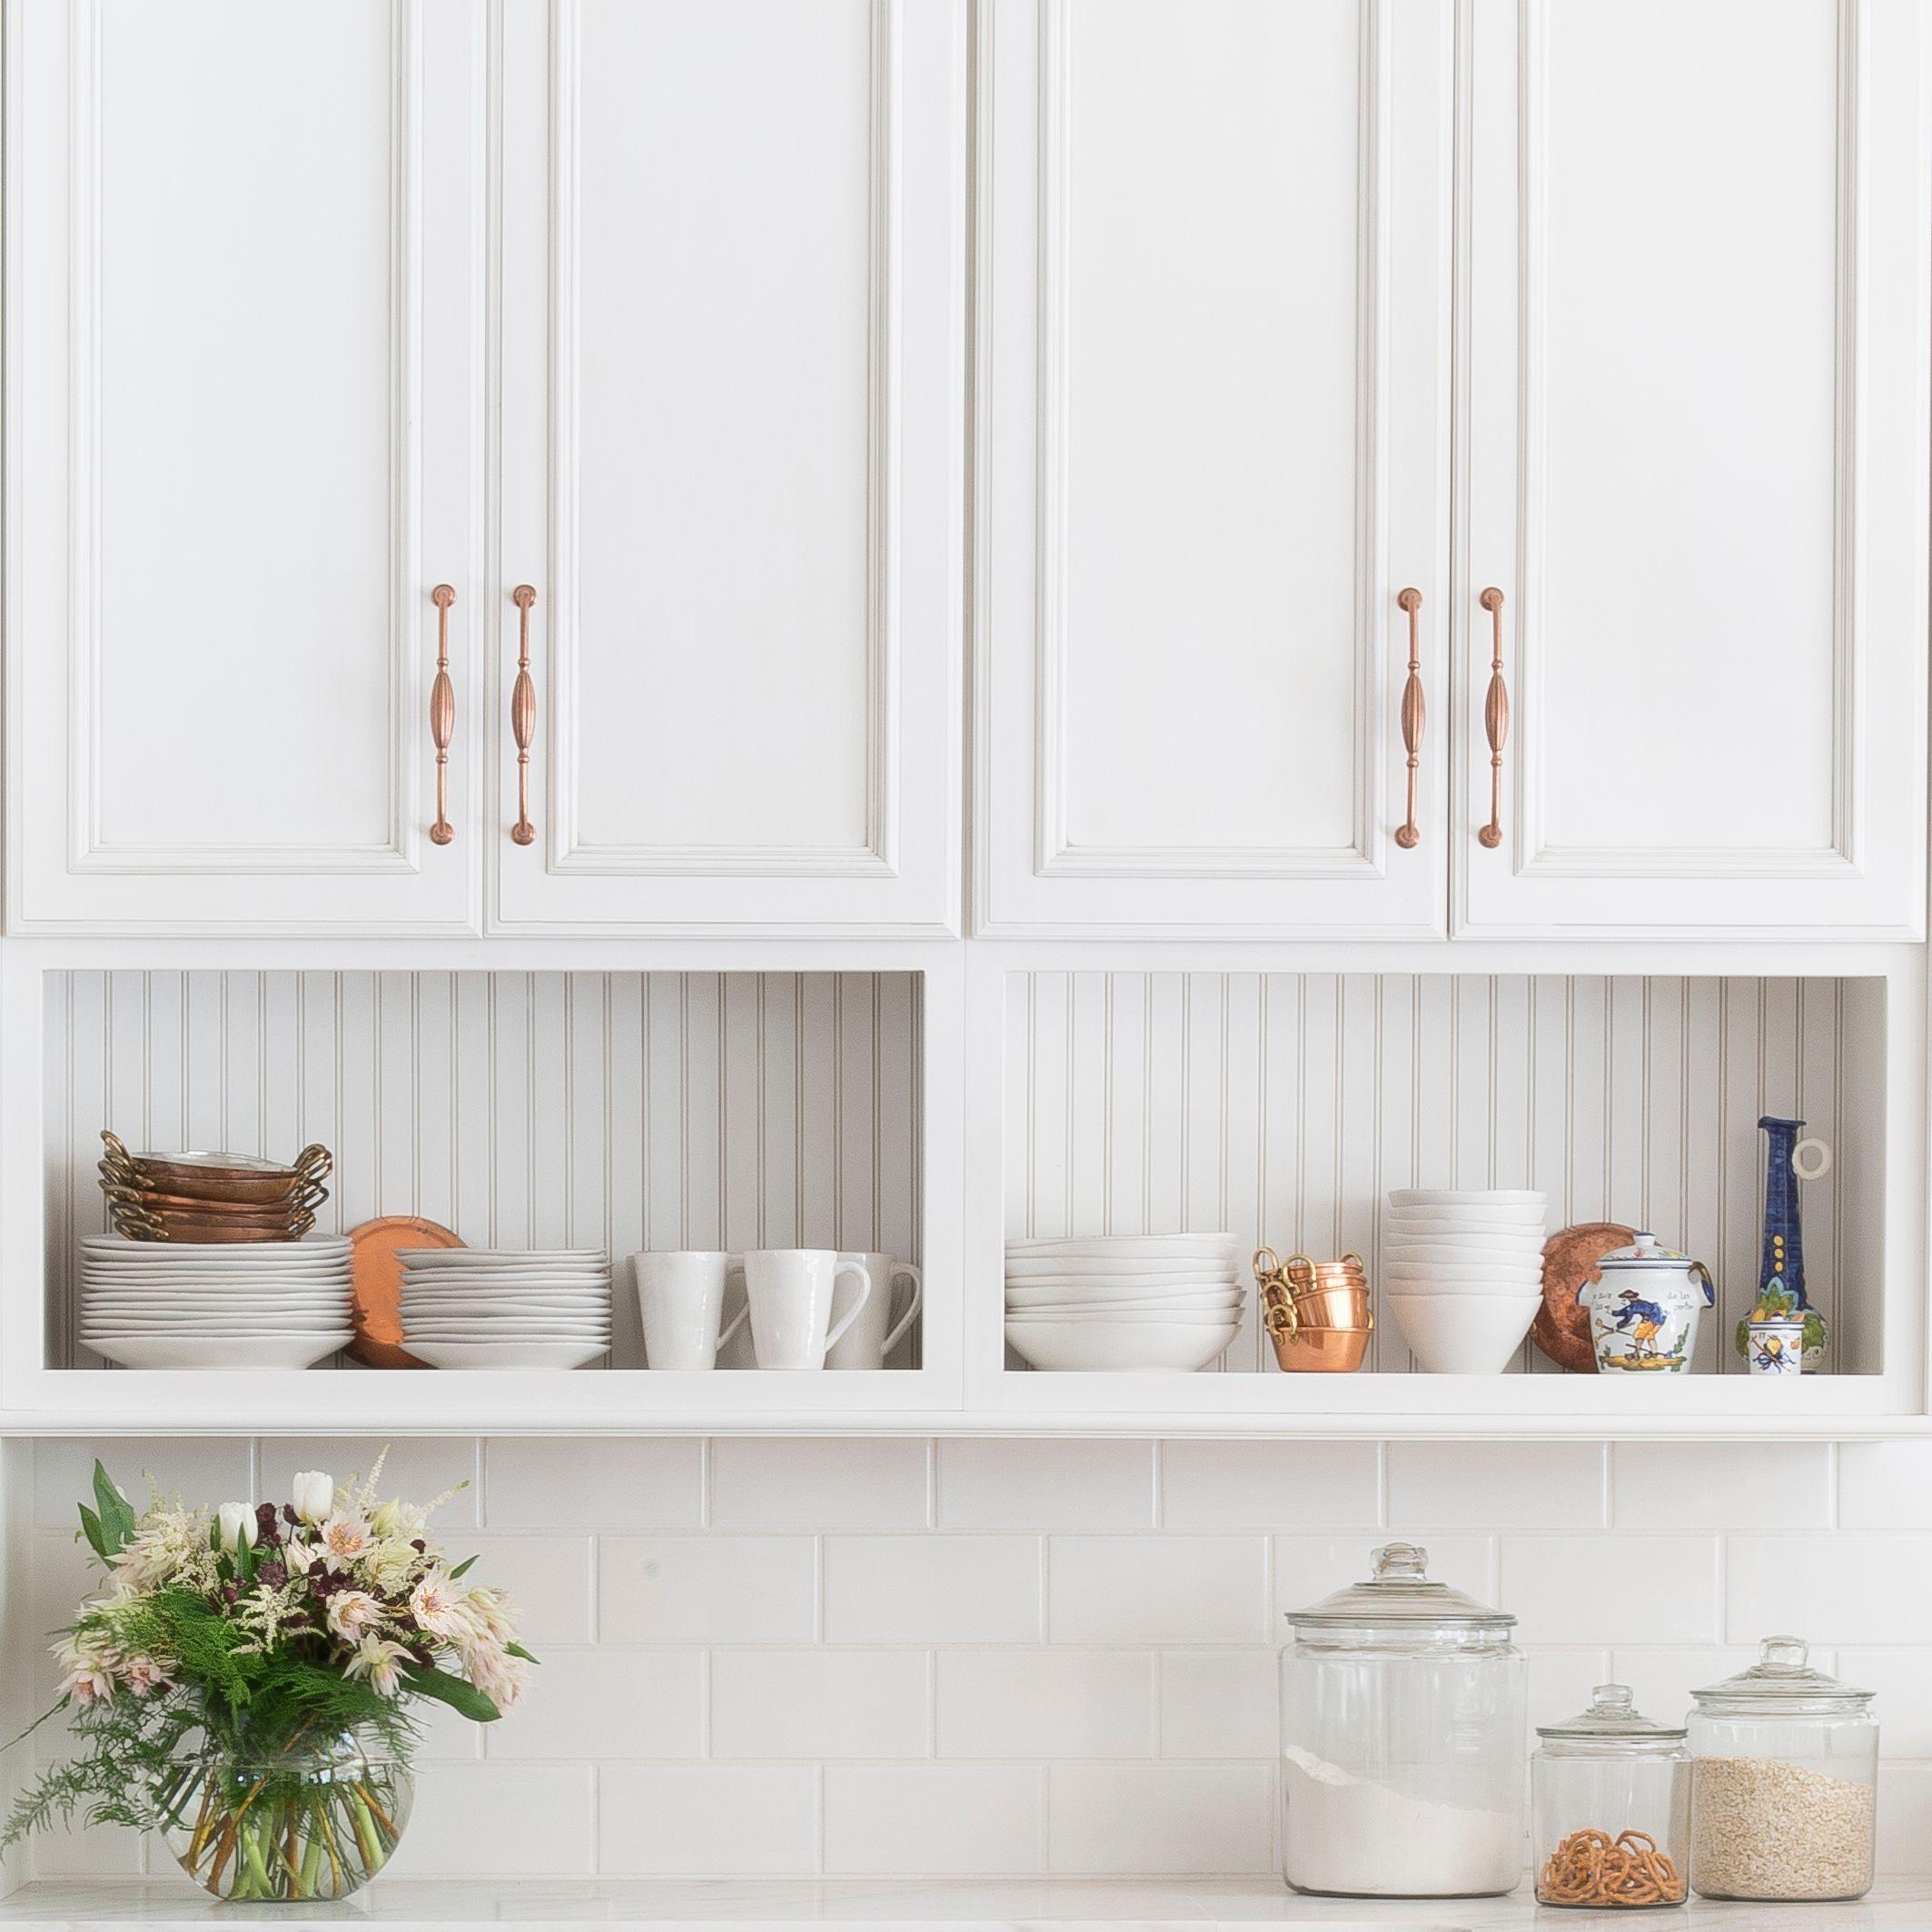 TREND ALERT! Brass is back and splashing color in kitchen designs ...